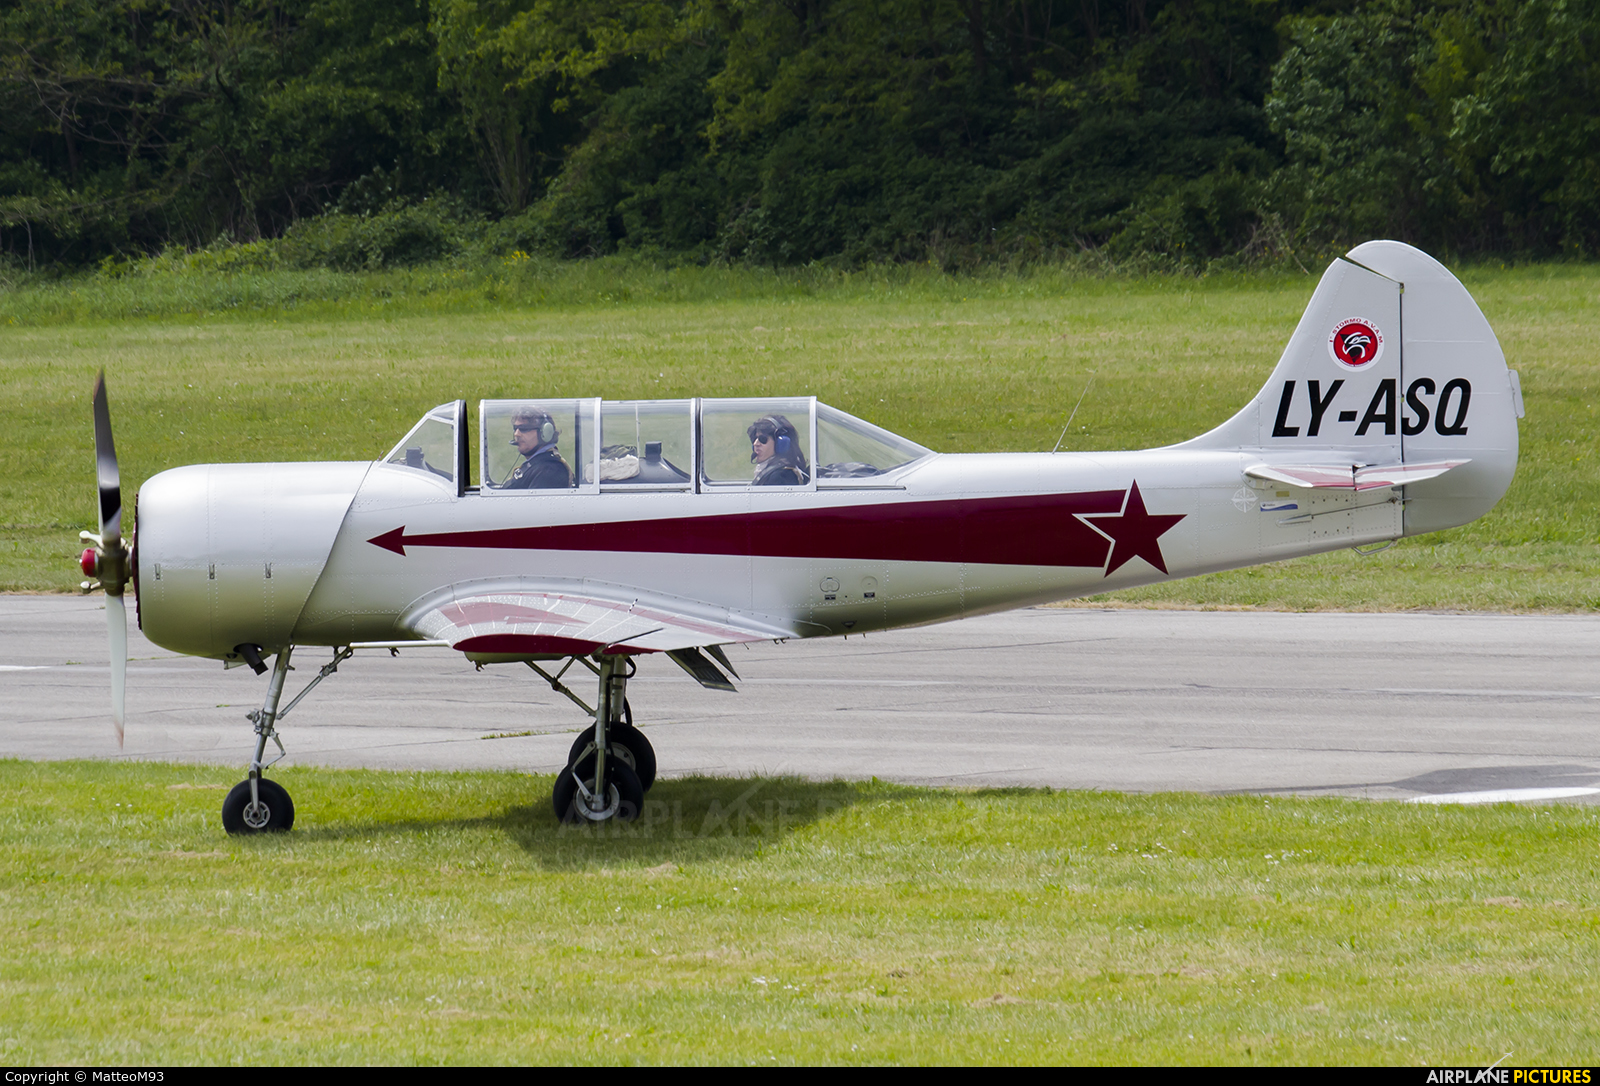 Private LY-ASQ aircraft at Alzate Brianza